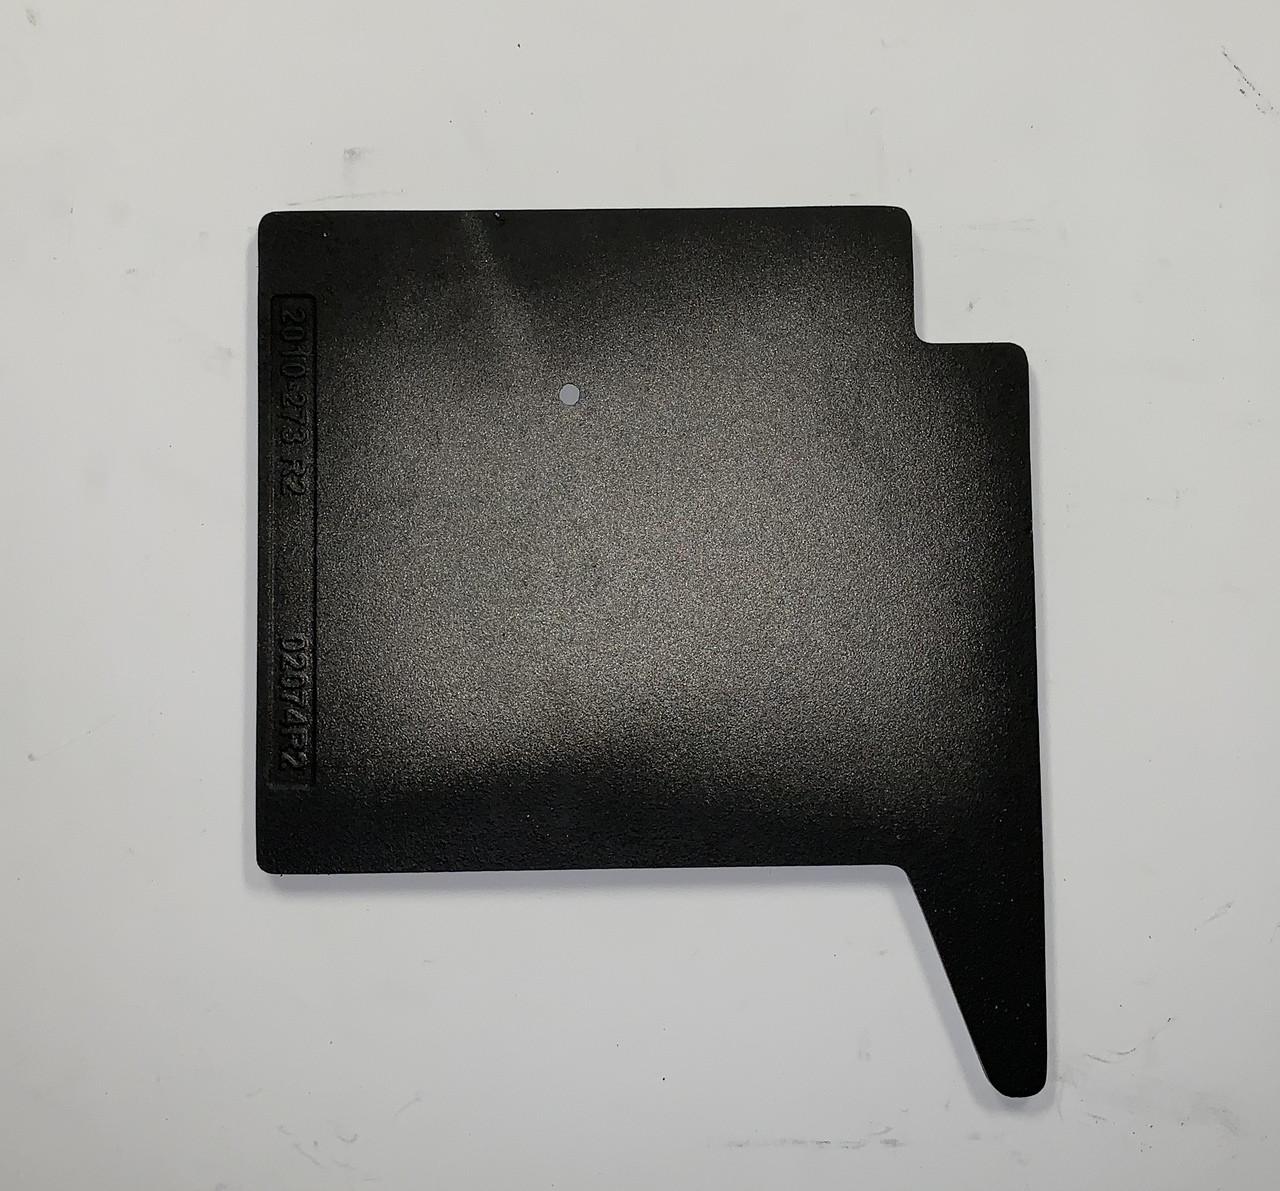 Hearthstone Heritage 8022/8023 Side Impact Plate 2010-273